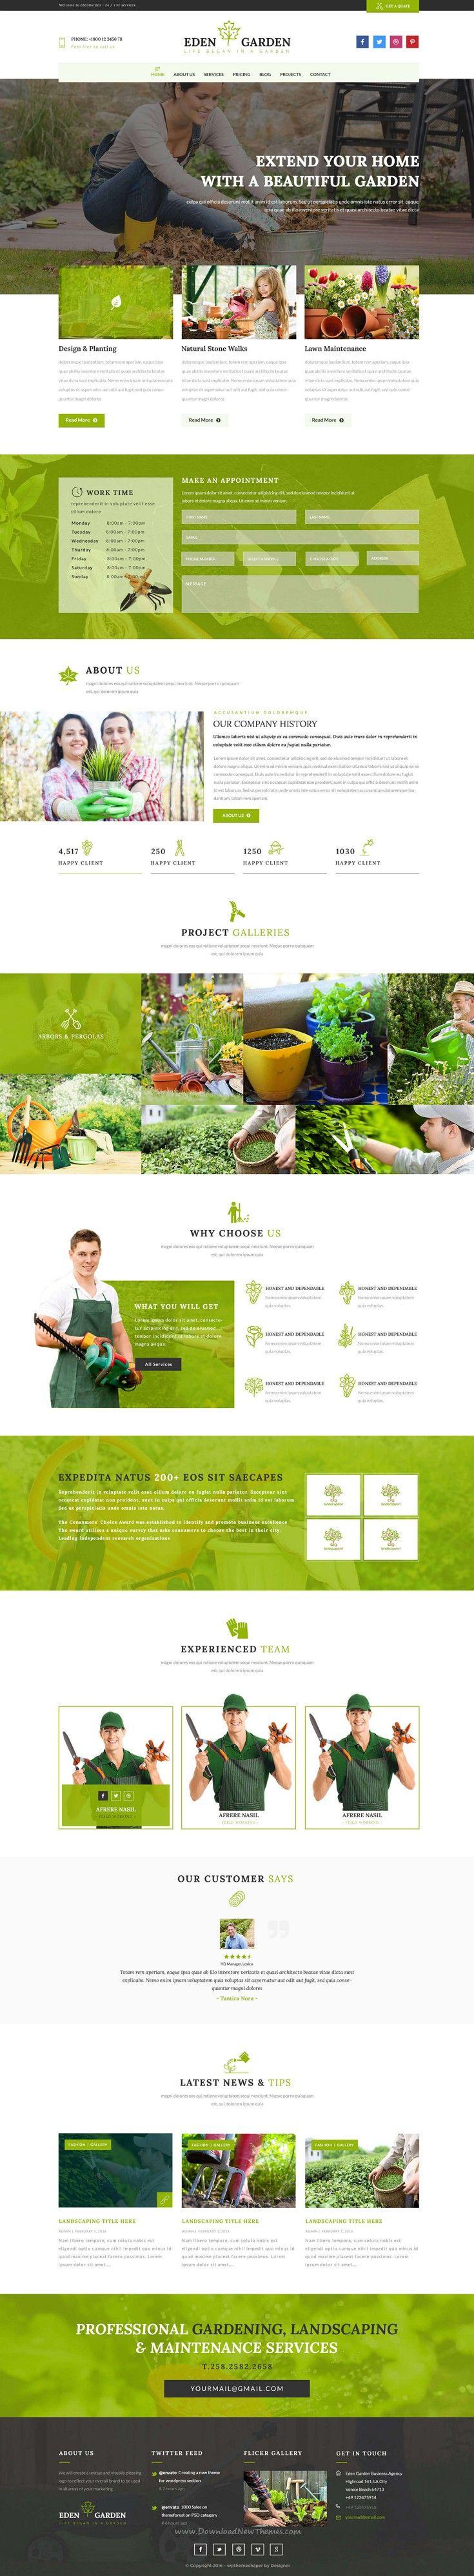 Eden Garden - Gardening and Landscaping PSD Template | Pagina web ...